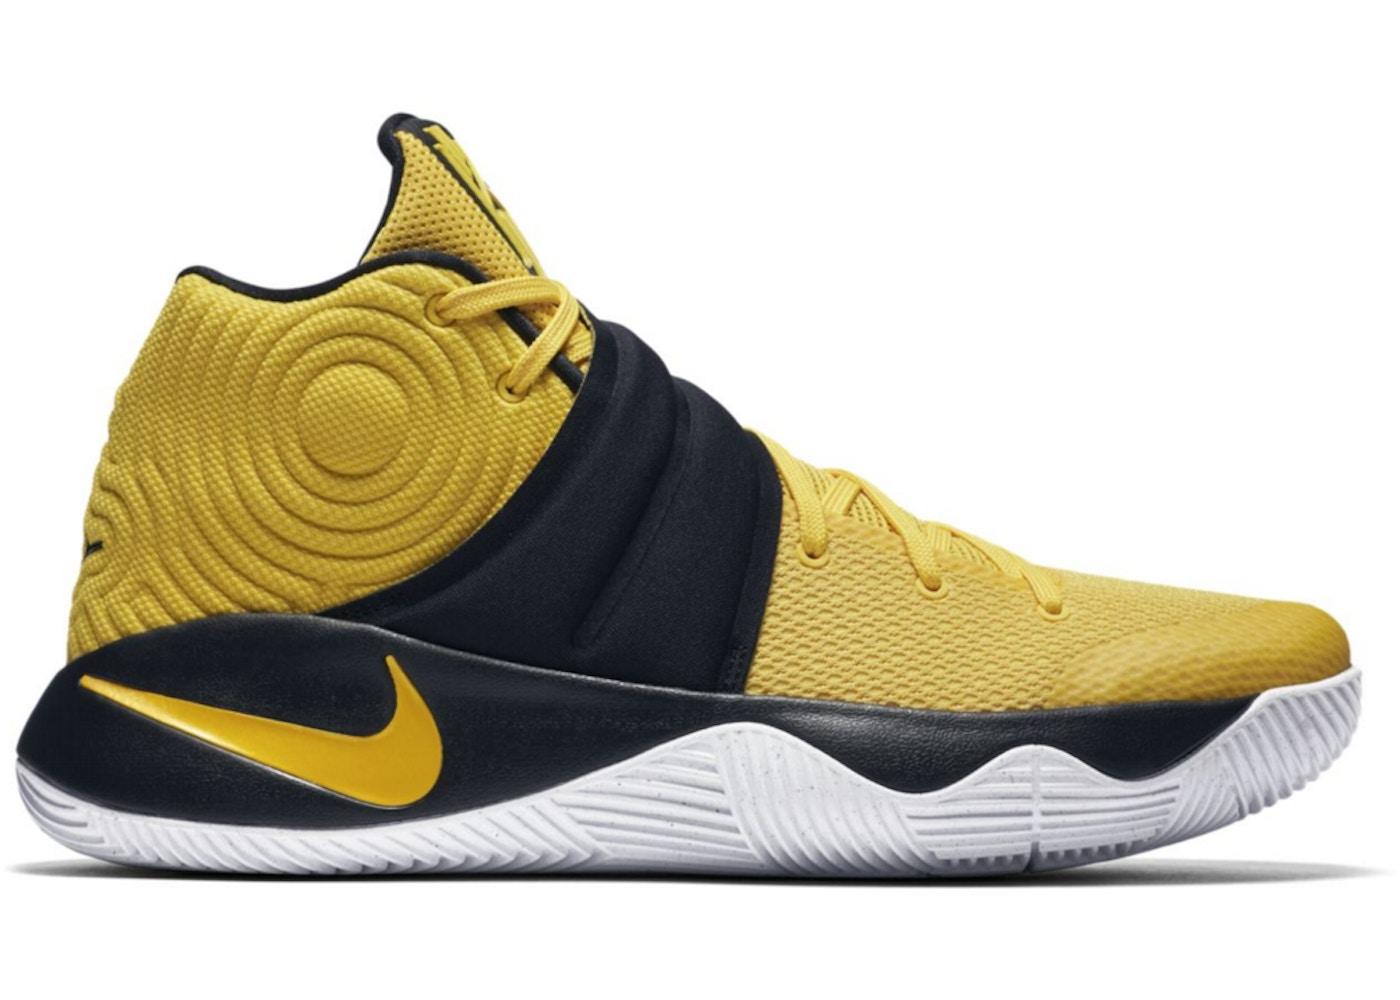 huge discount 132f3 1ef3b Nike Basketball Kyrie Shoes - Volatility